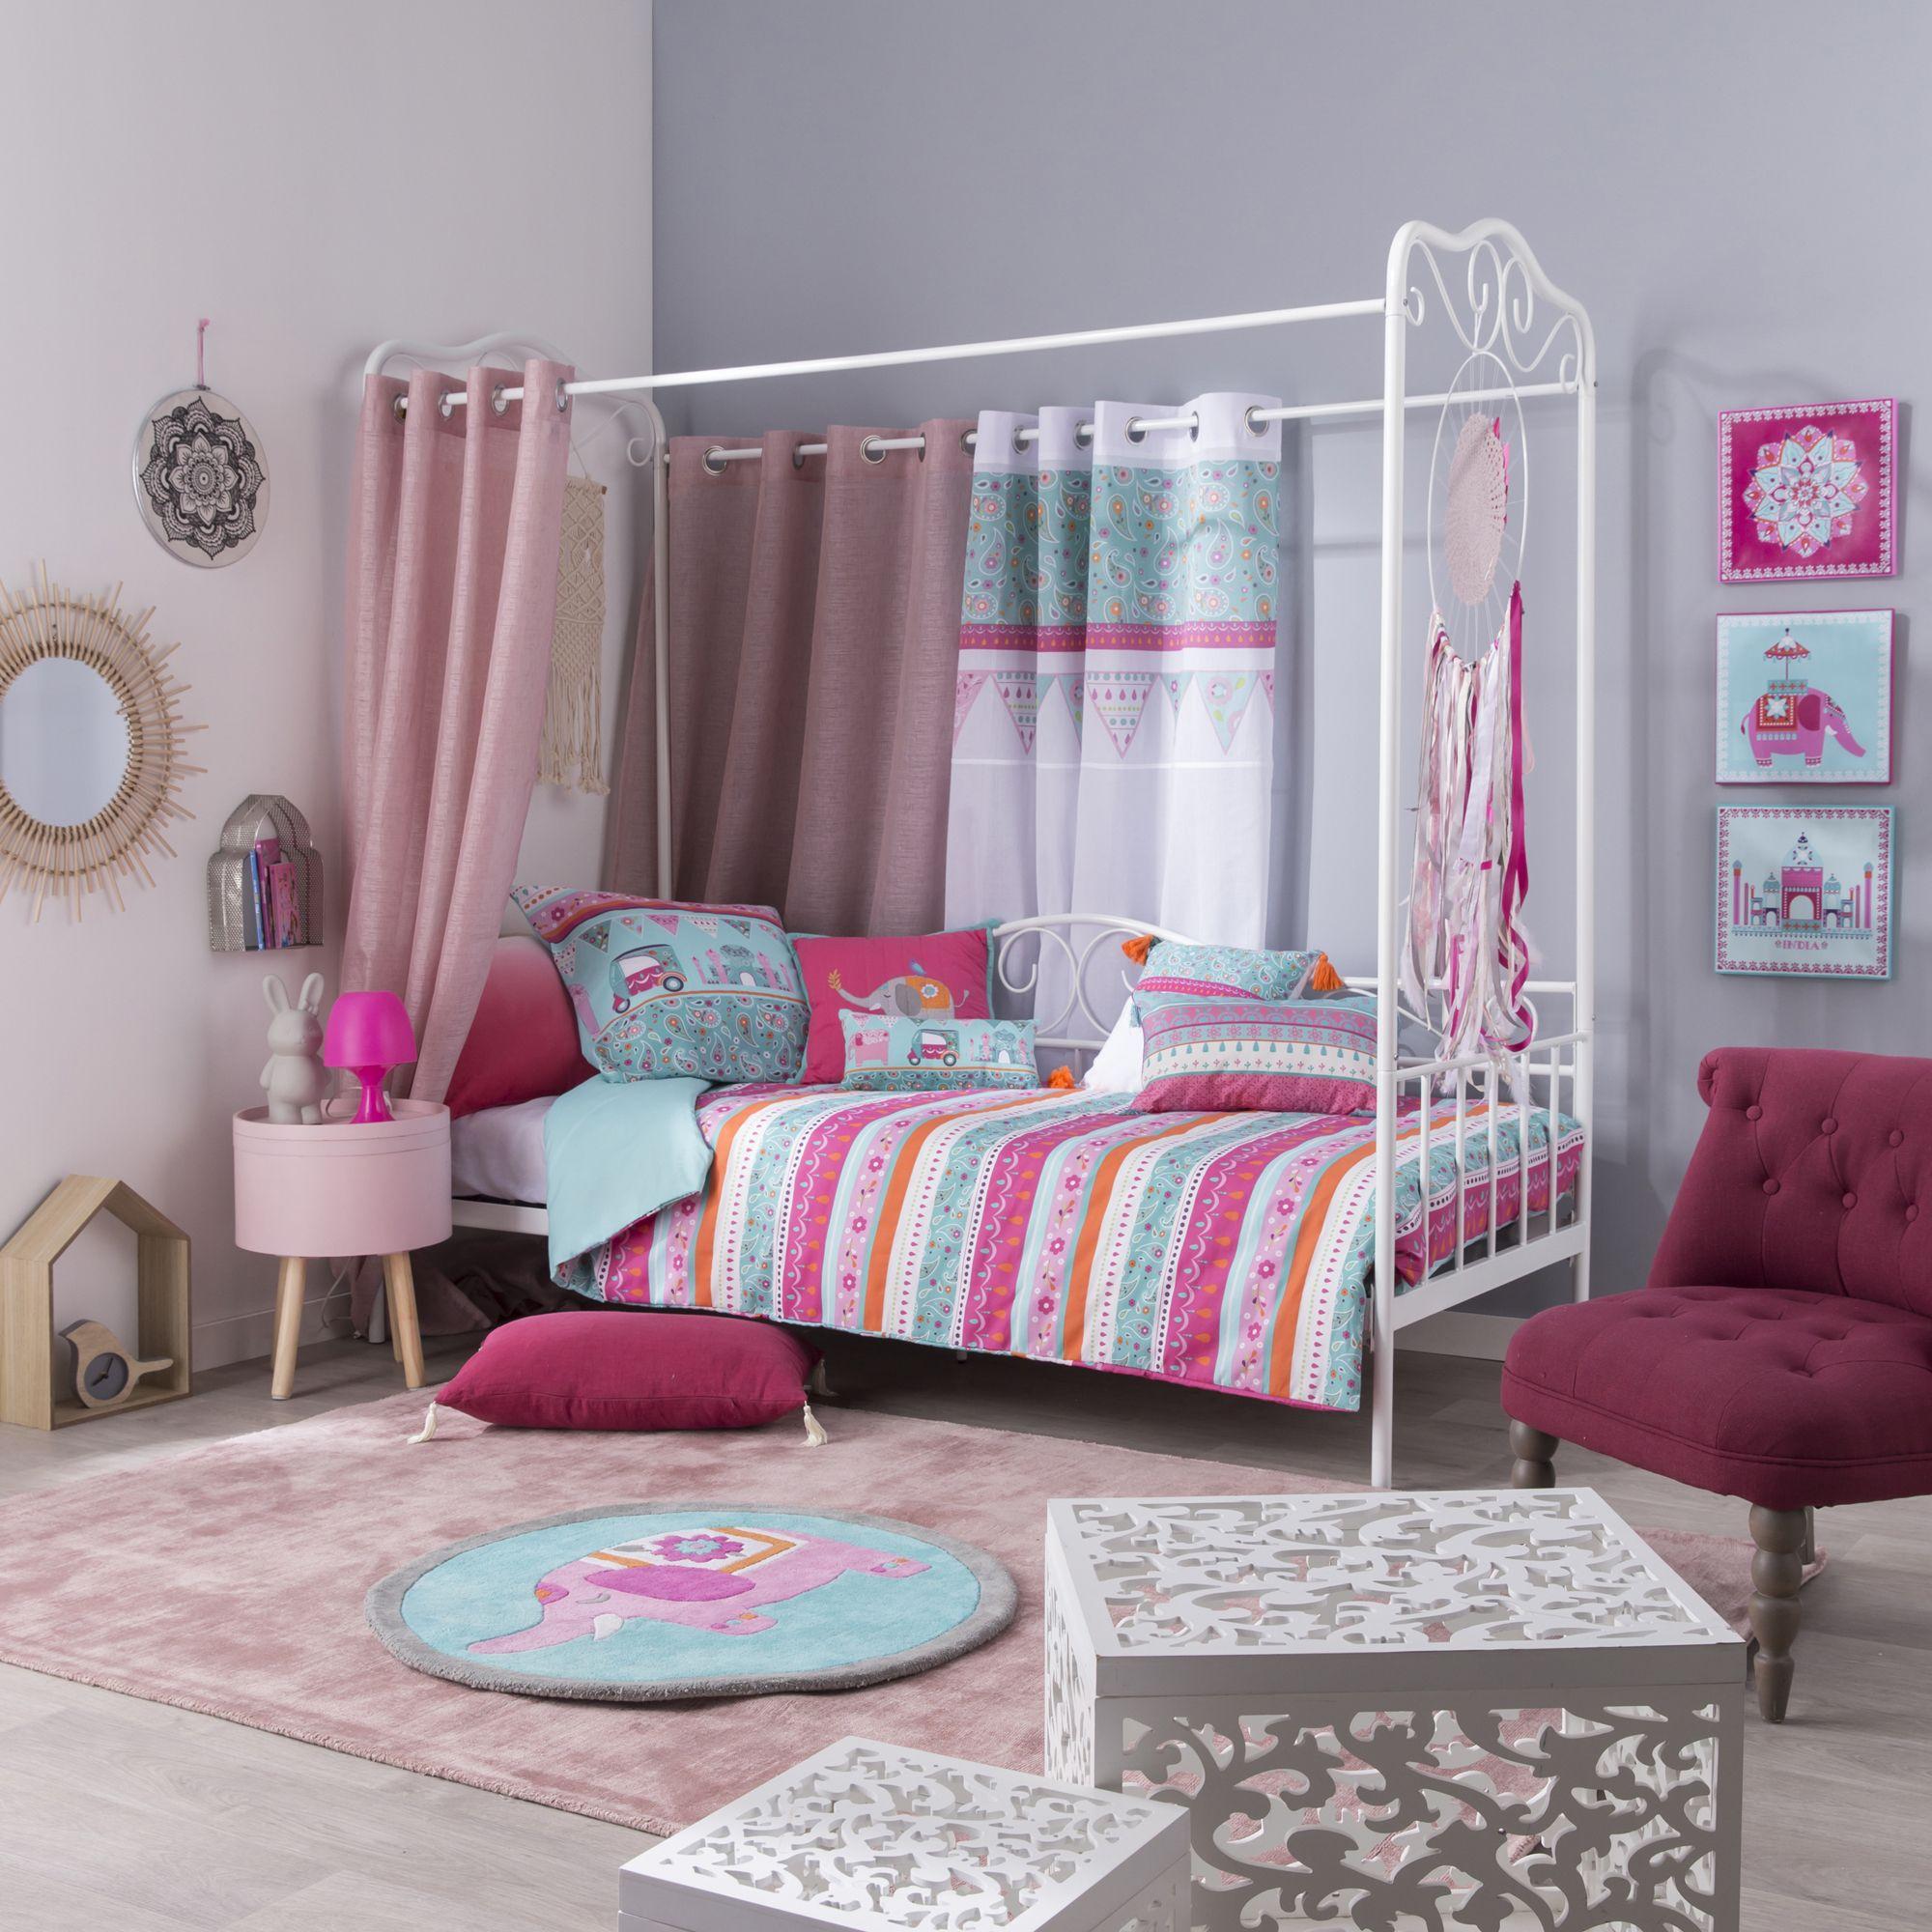 Chambre Pour Filles Alinea Deco Chambre Bebe Deco Chambre Idee Deco Chambre Enfant